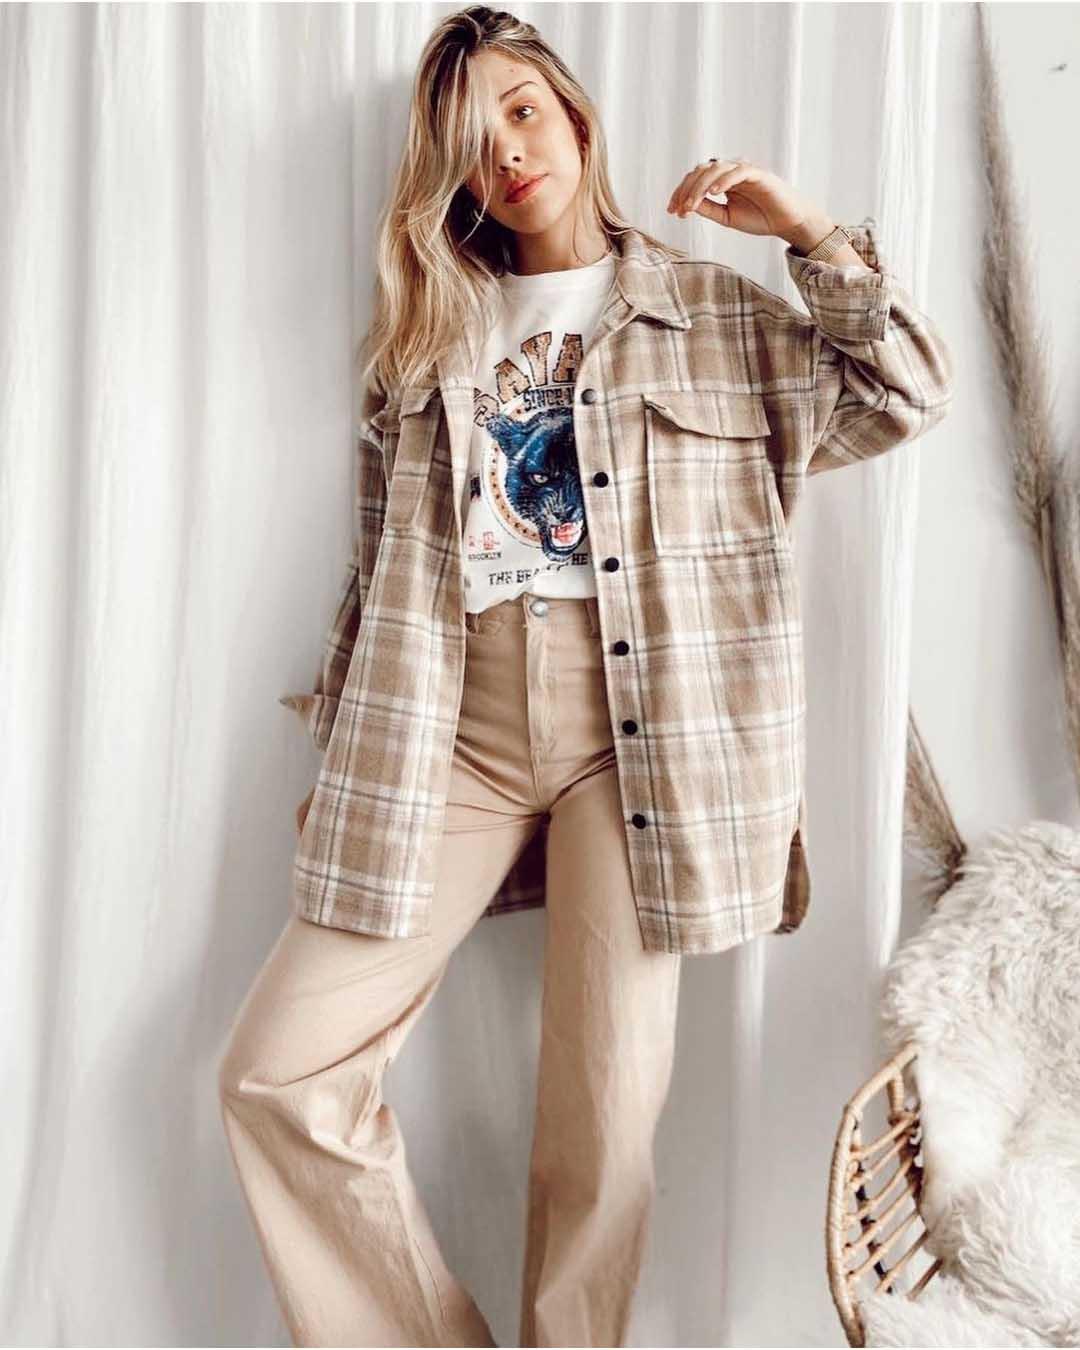 camisas a cuadros pantalones tiro alto beige remera invierno 2021 moda mujer